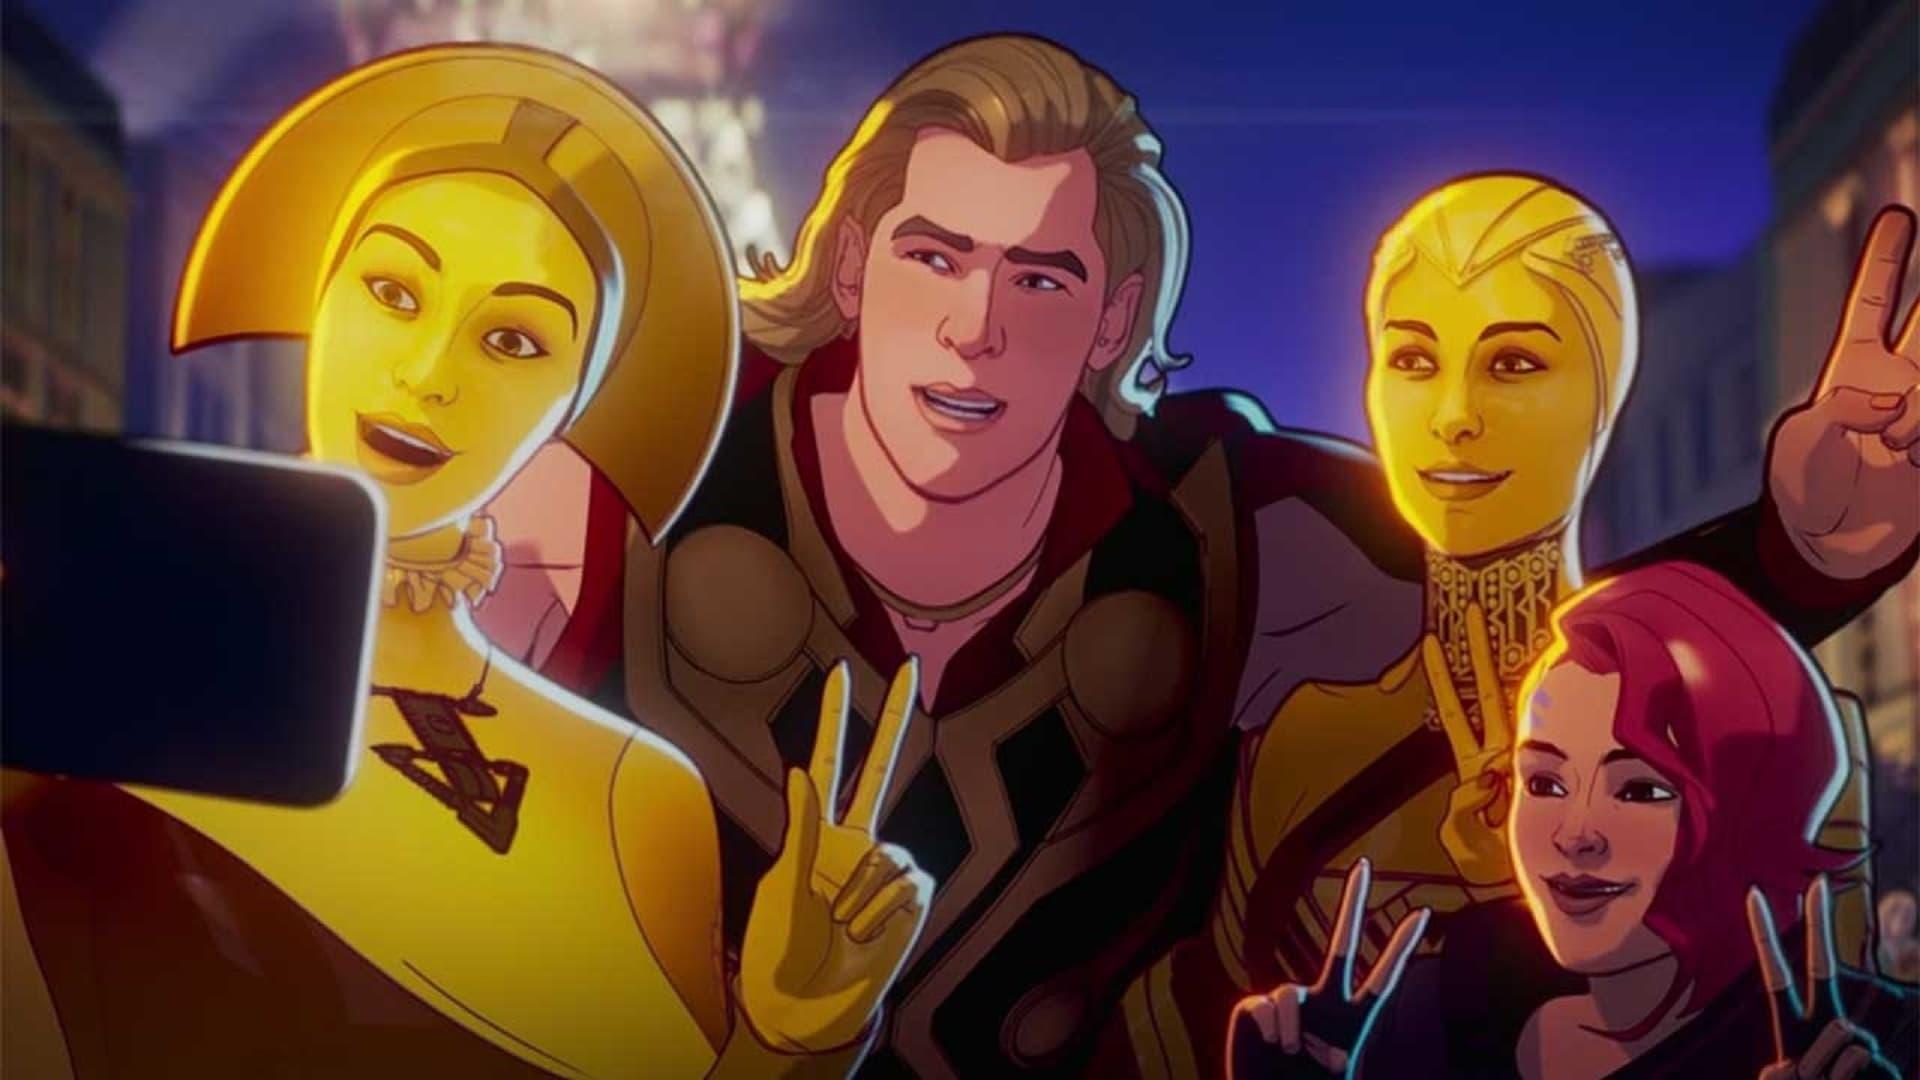 REVIEW Episodio 7 de What If: la fiesta de Thor para ver en Disney Plus